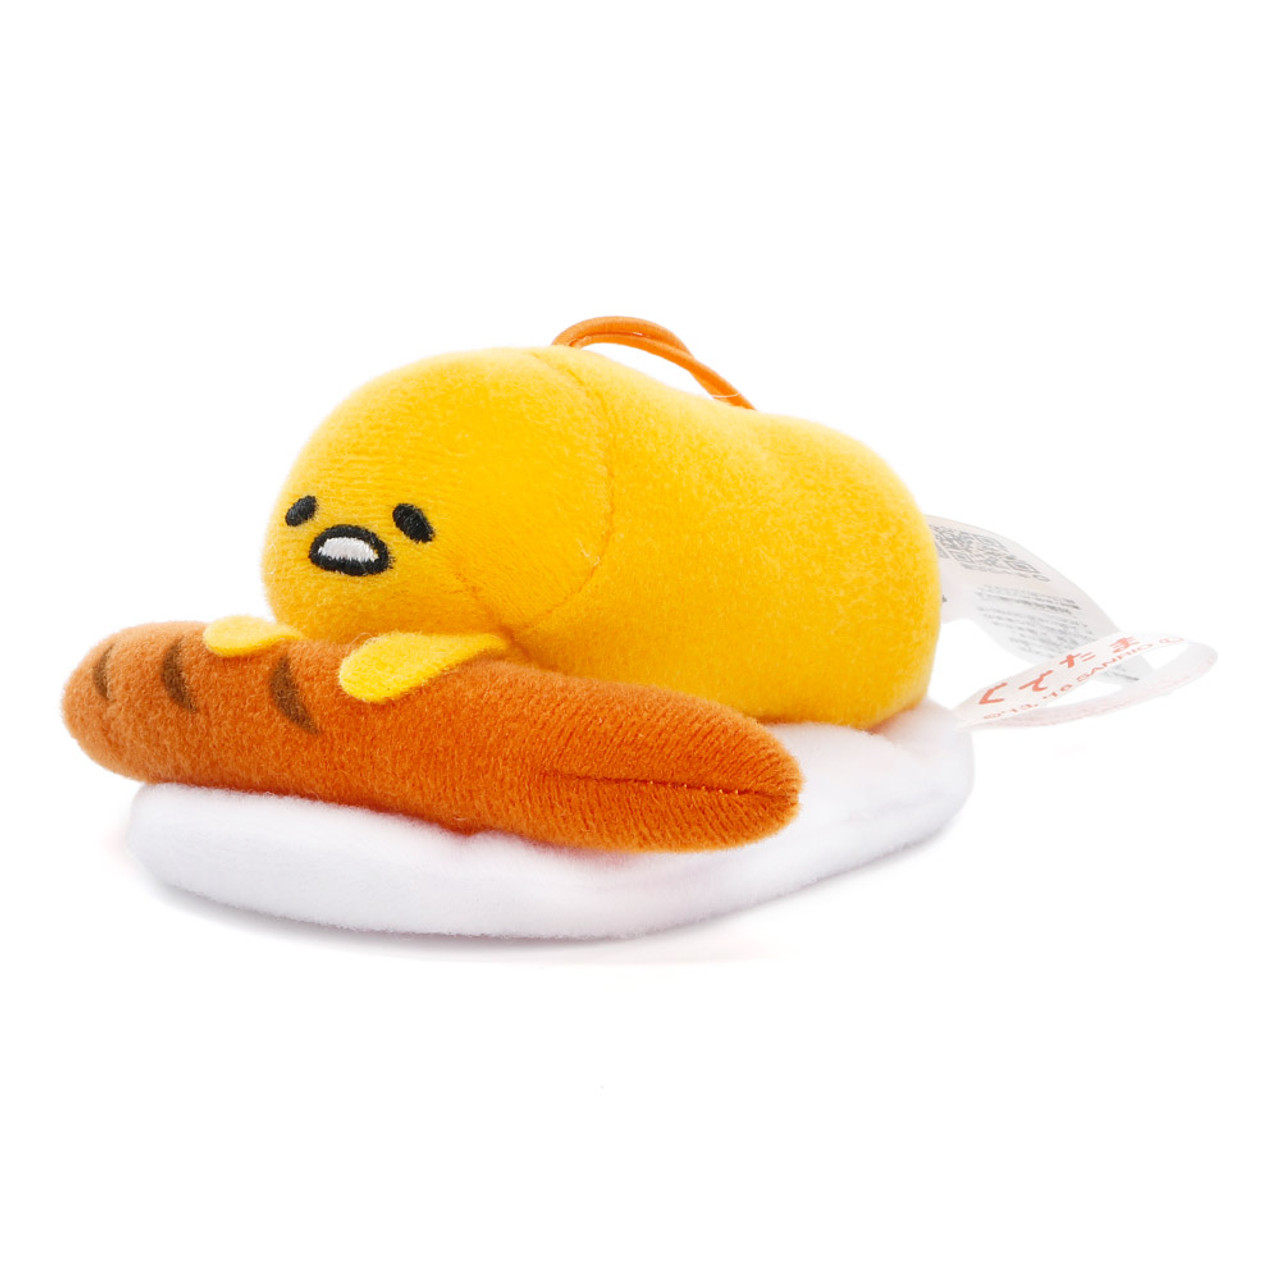 Sanrio Gudetama Lazy Egg Sleeping Mascot Plush Charms - Sausage ( Side View )